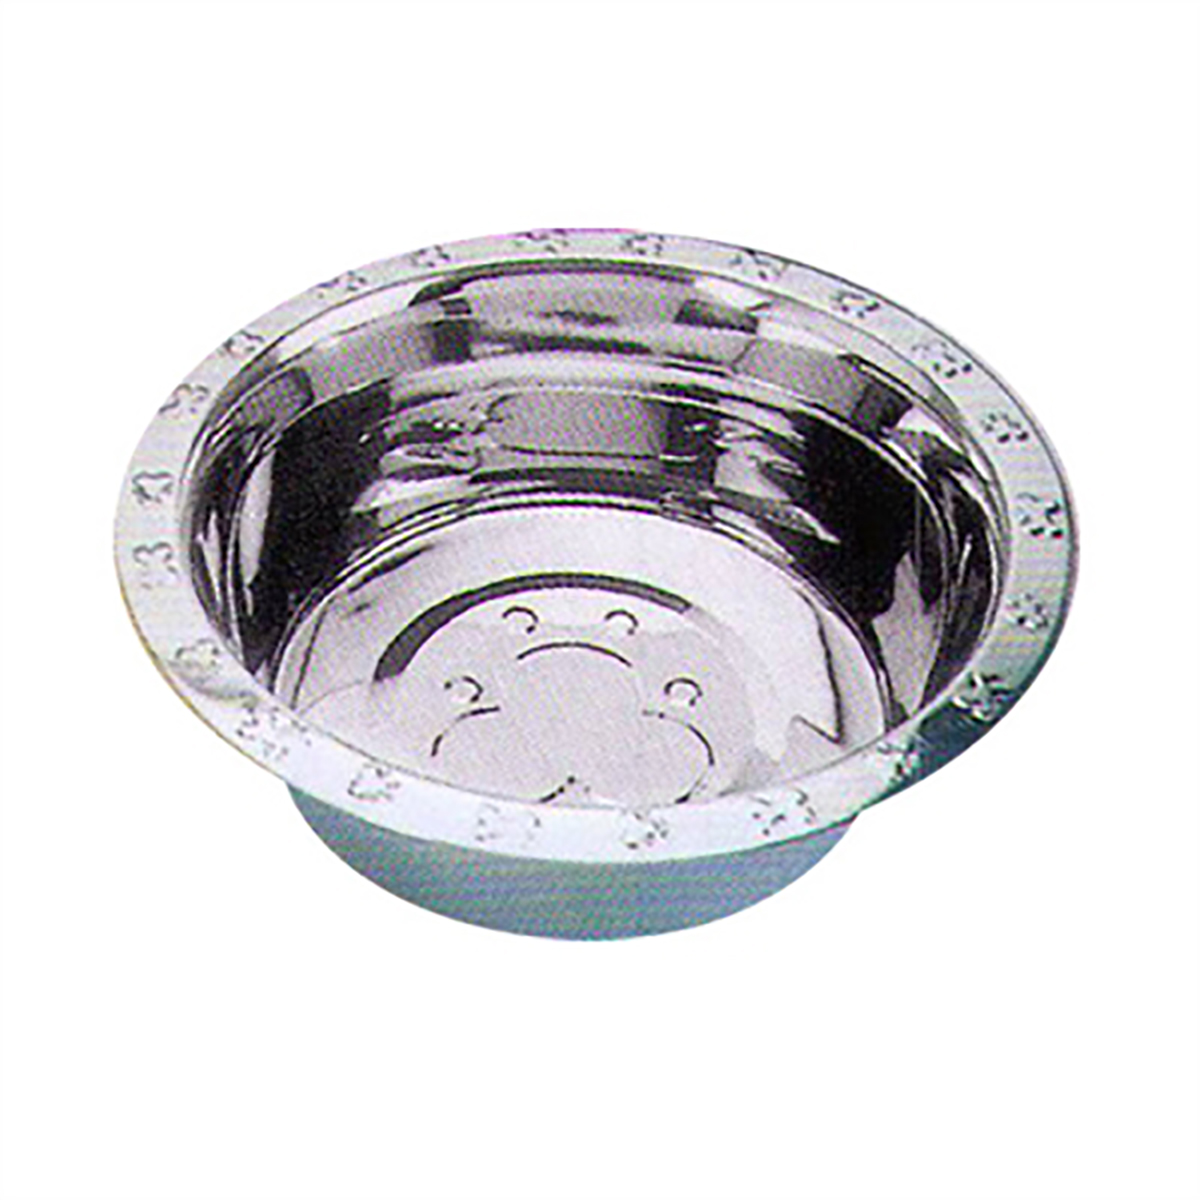 Embossed Rim Dog Bowl by QT Dog